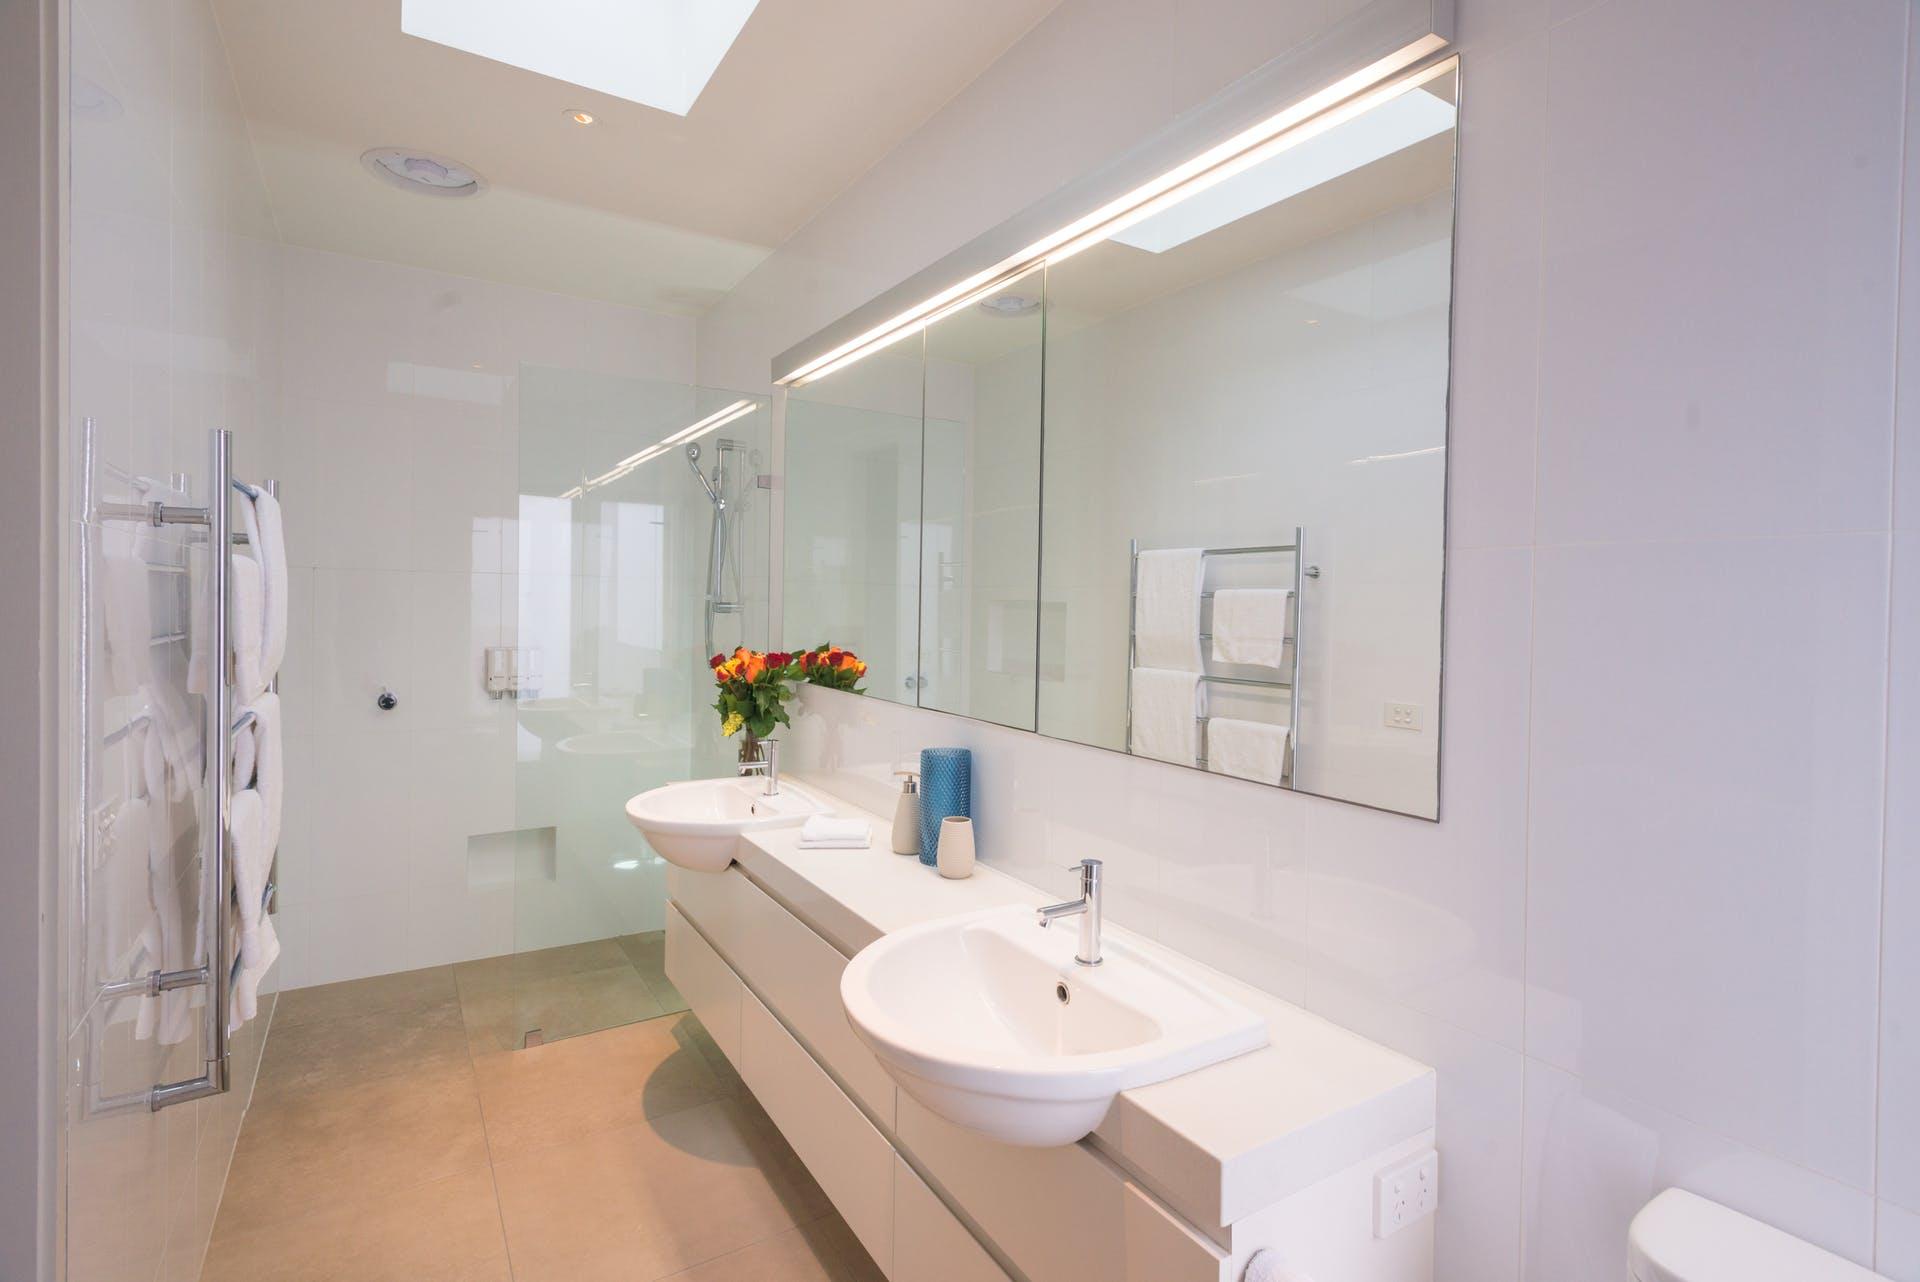 601-king-street-west-melbourne-student-accommodation-Melbourne-Bathroom-Unilodgers